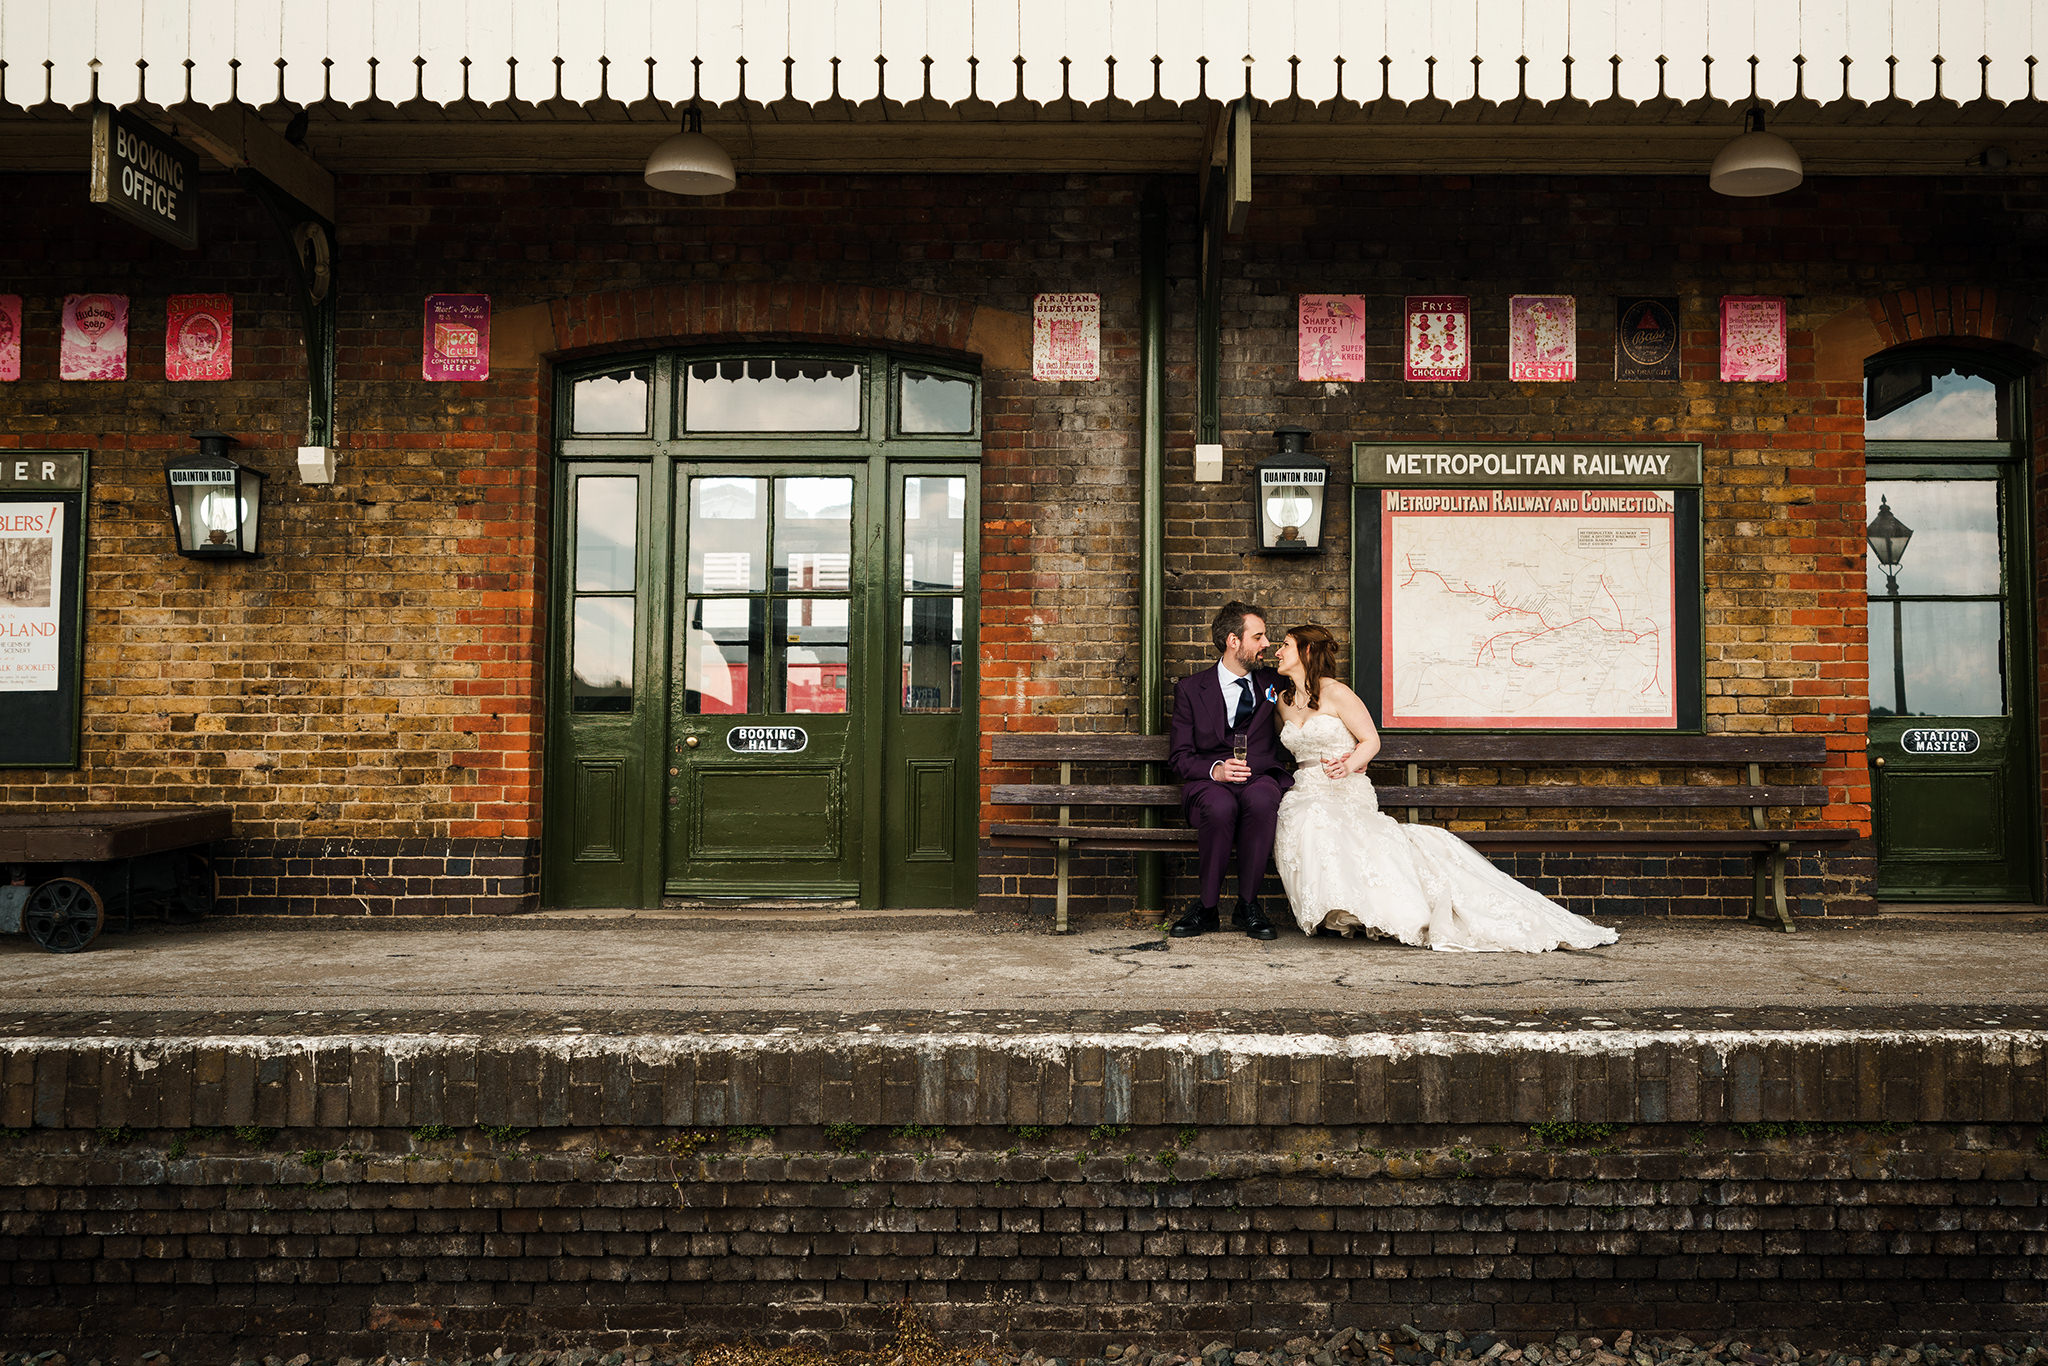 Wedding Gallery - Buckinghamshire Railway CentreCOMING SOON